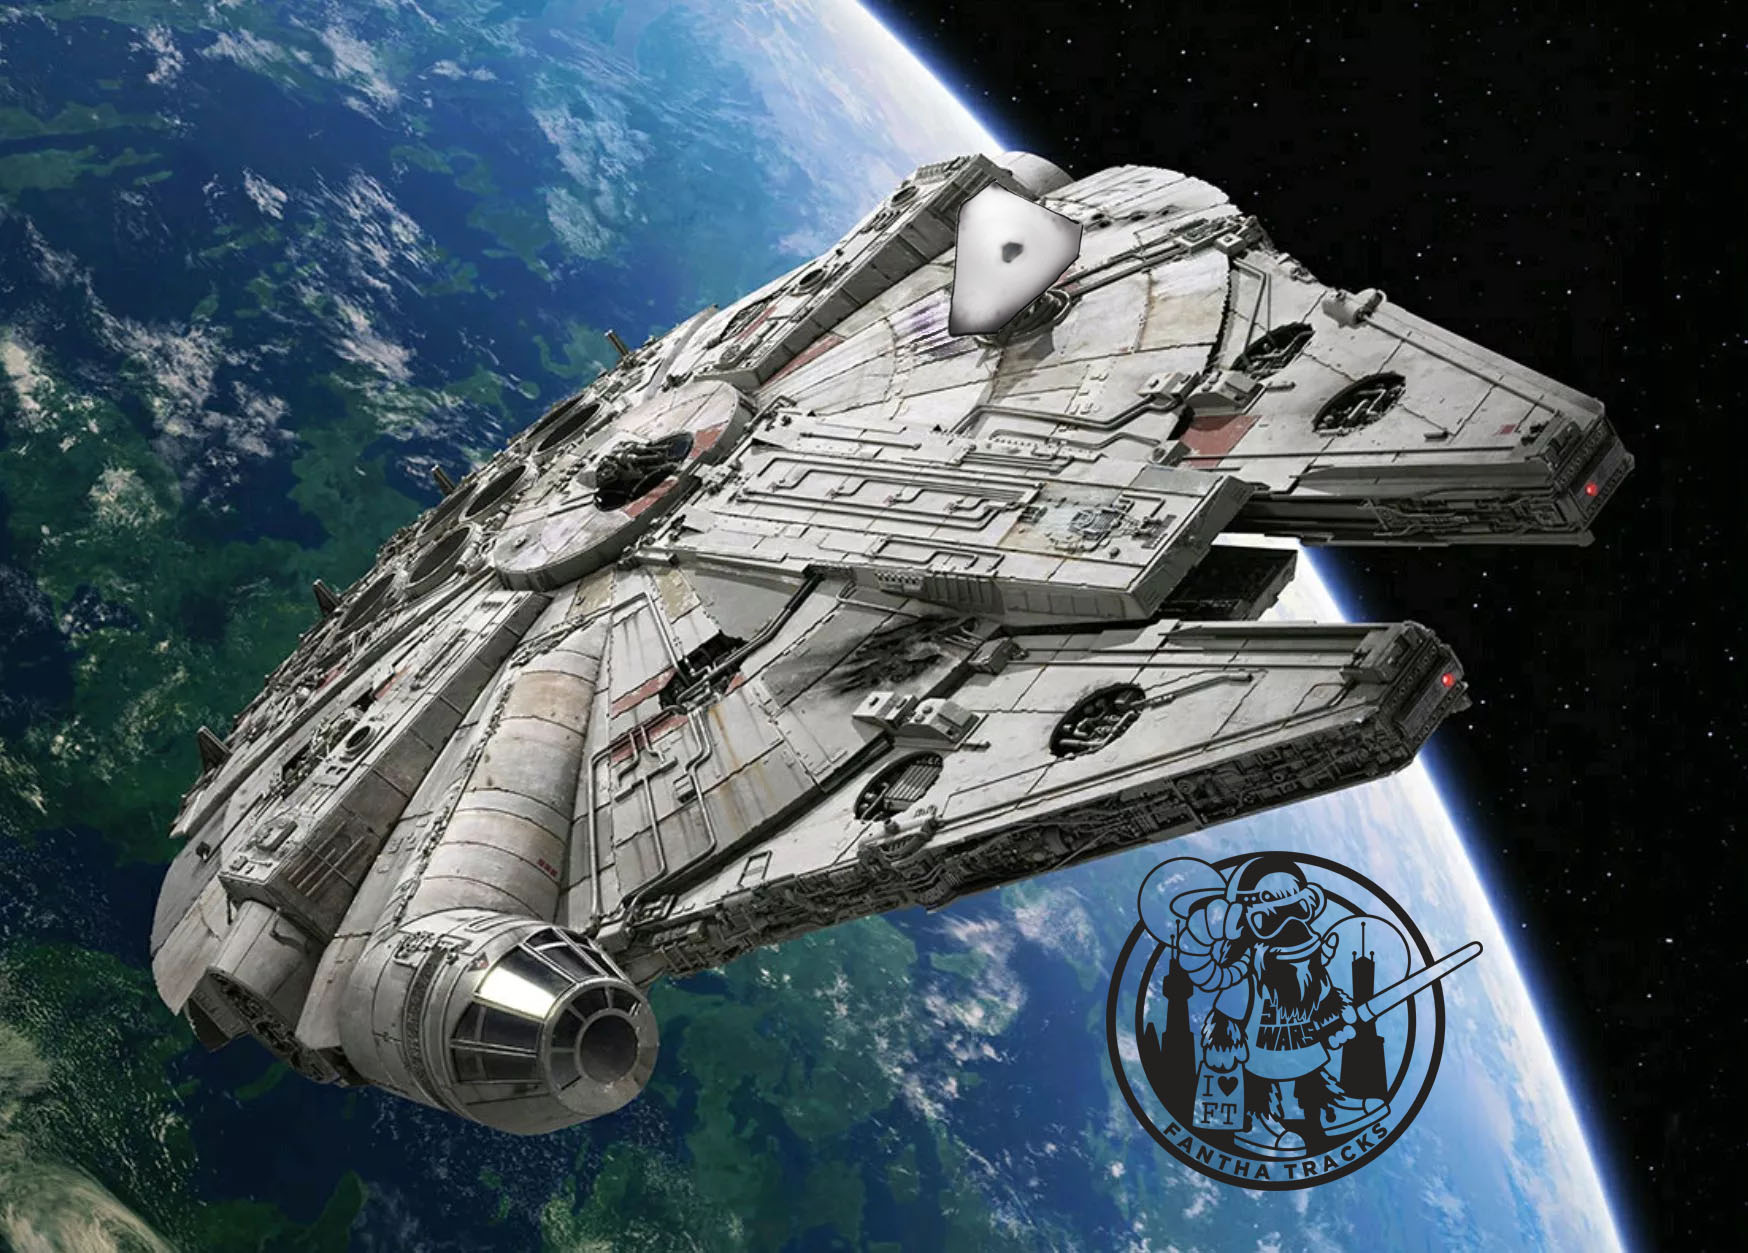 new-sensory-array-millennium-falcon-episode-9.jpg